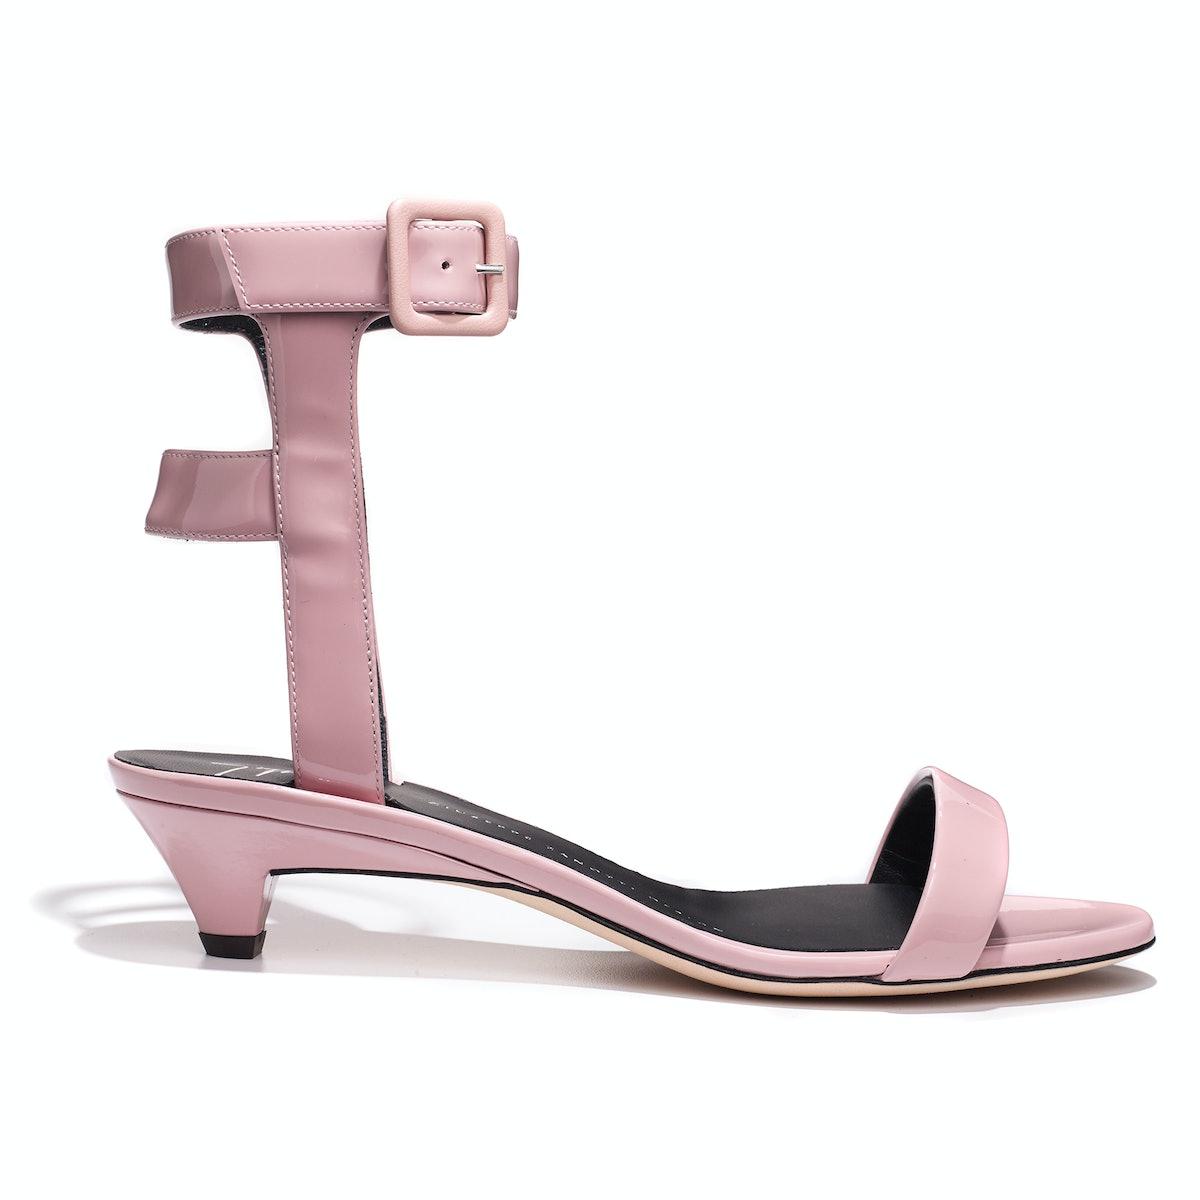 Giuseppe Zanotti Design sandals